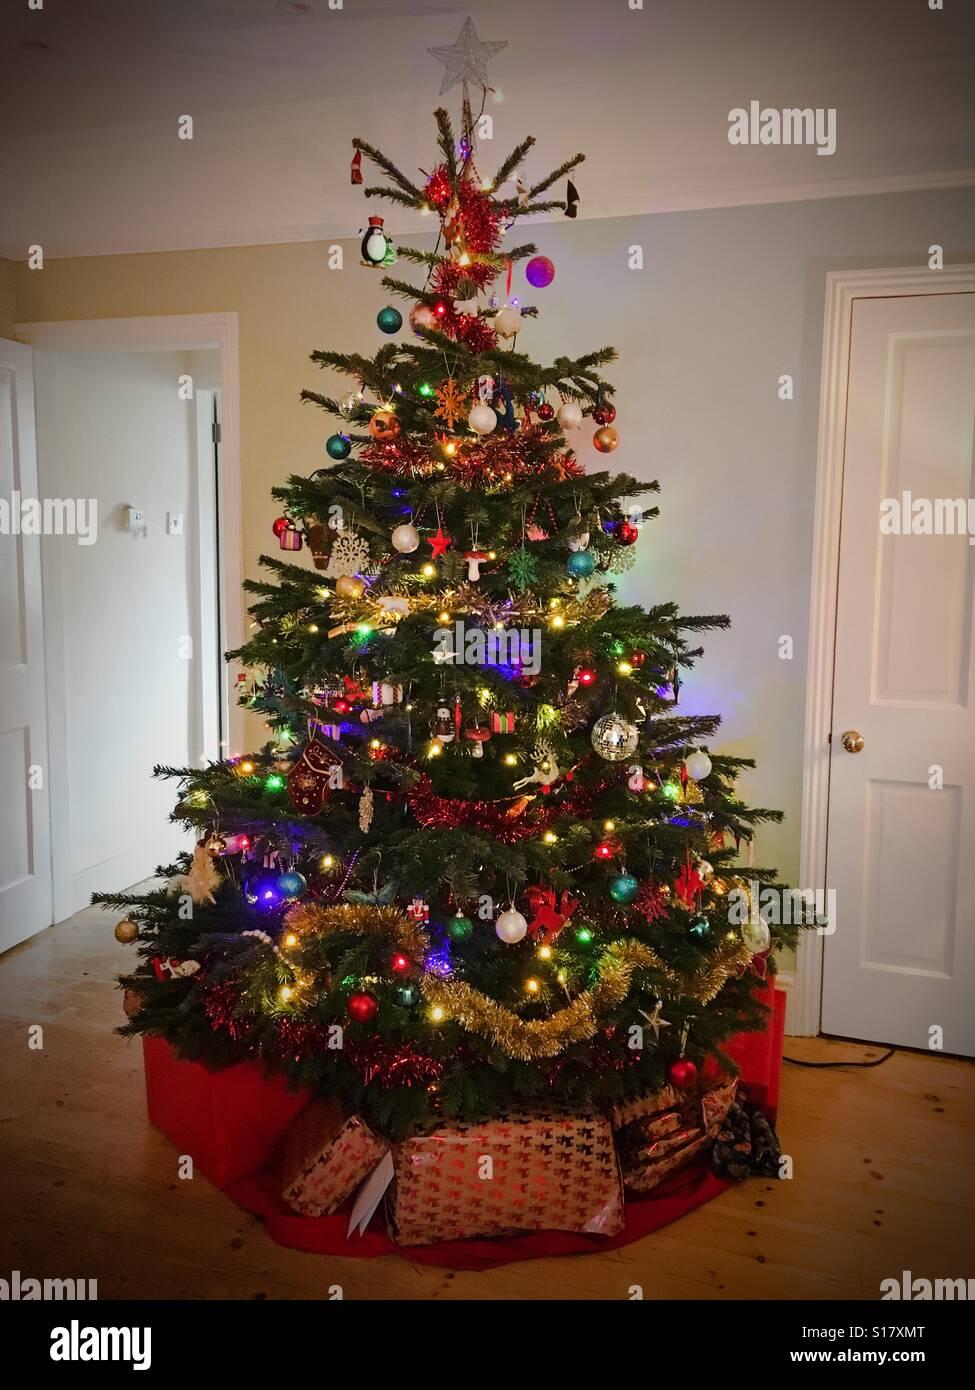 Christmas Tree With Presents Underneath Stock Photos Christmas